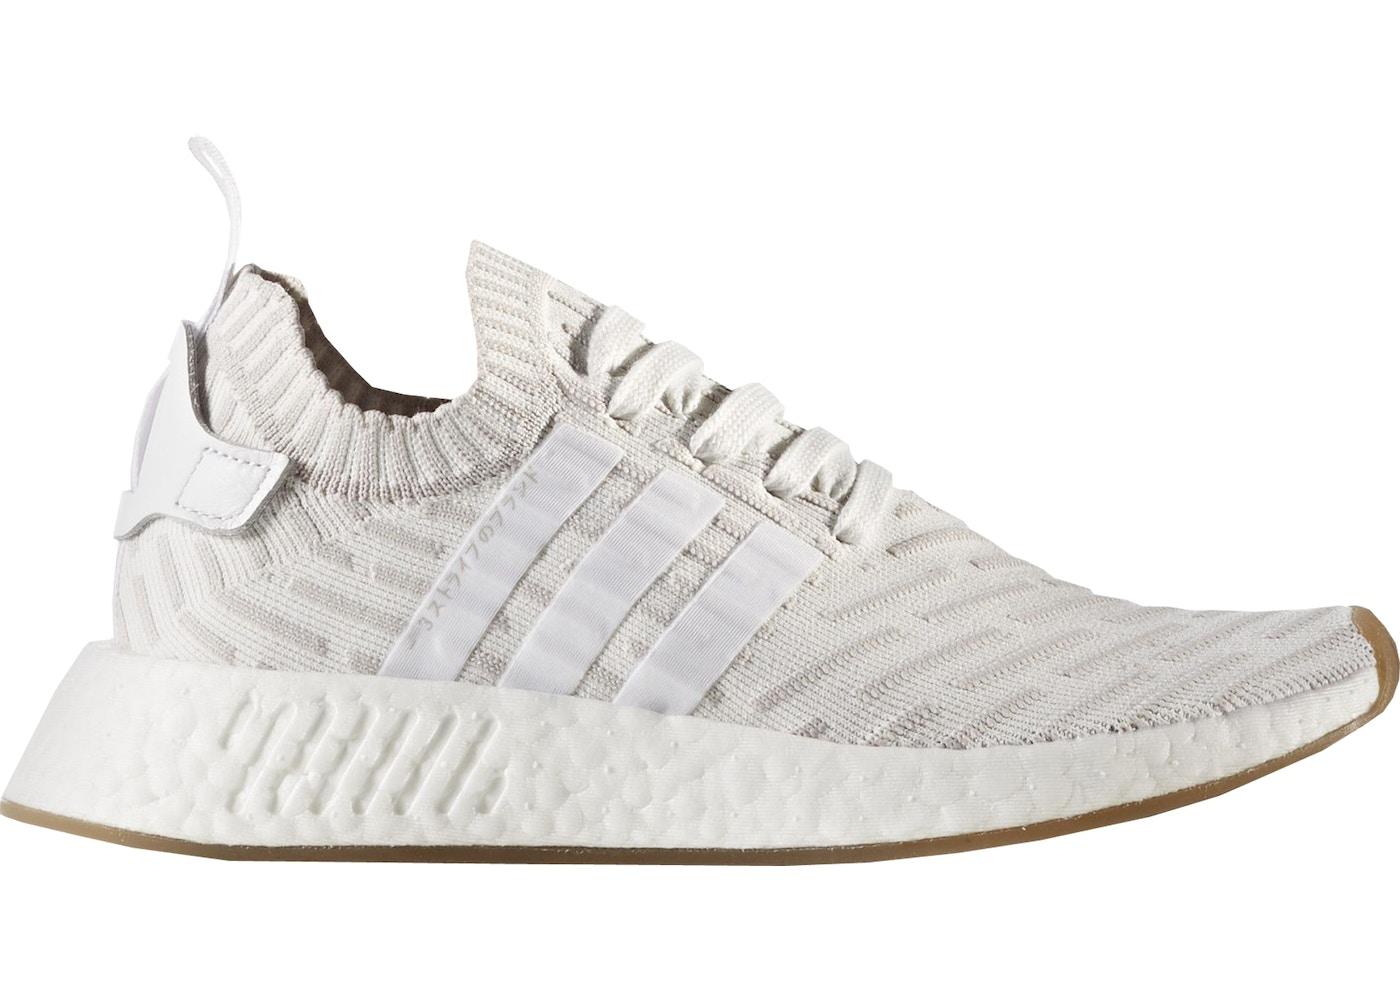 Adidas R2 PinkwBy9954 Shock Running Nmd White pSzUqVLMG